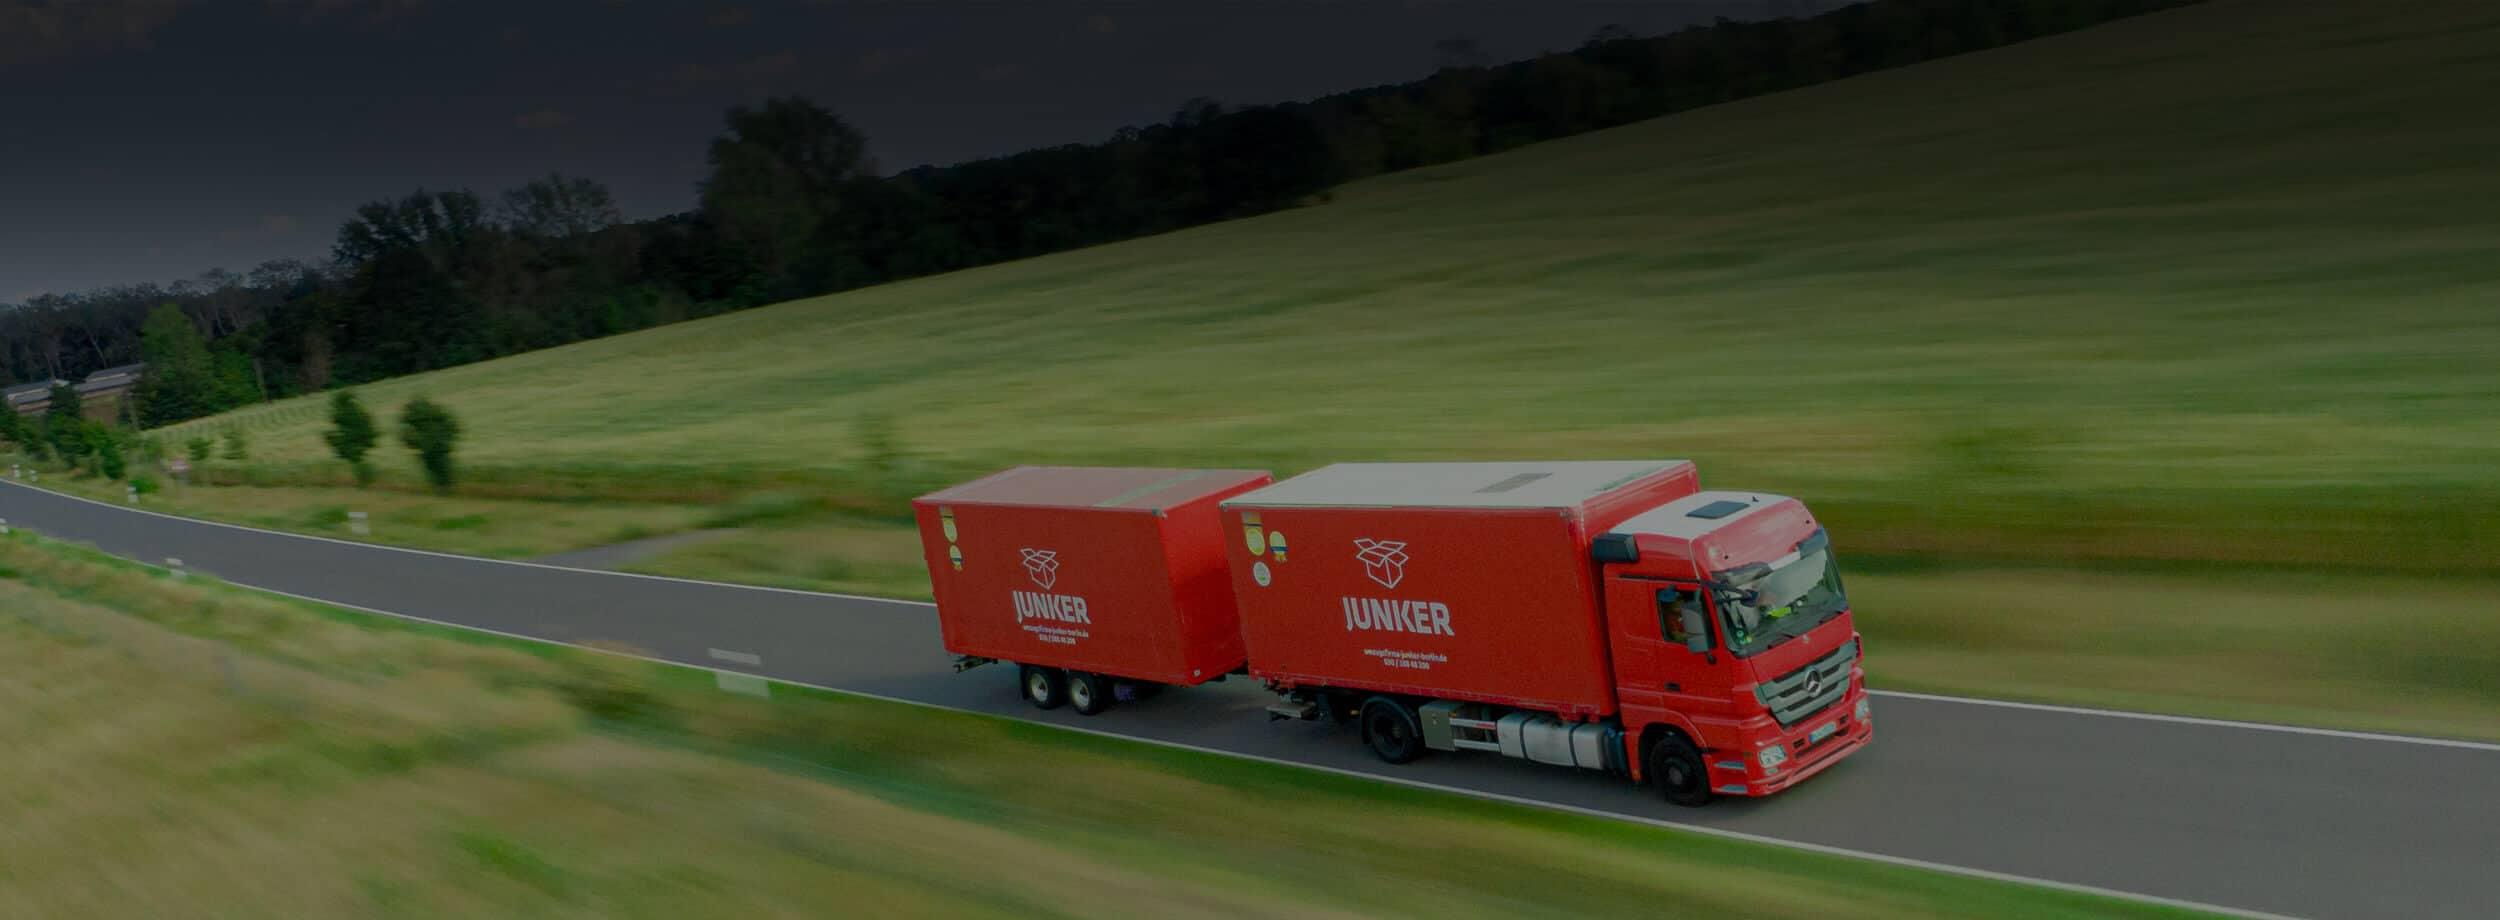 Junker Umzüge Berlin - Umzugs-LKW auf dem Weg